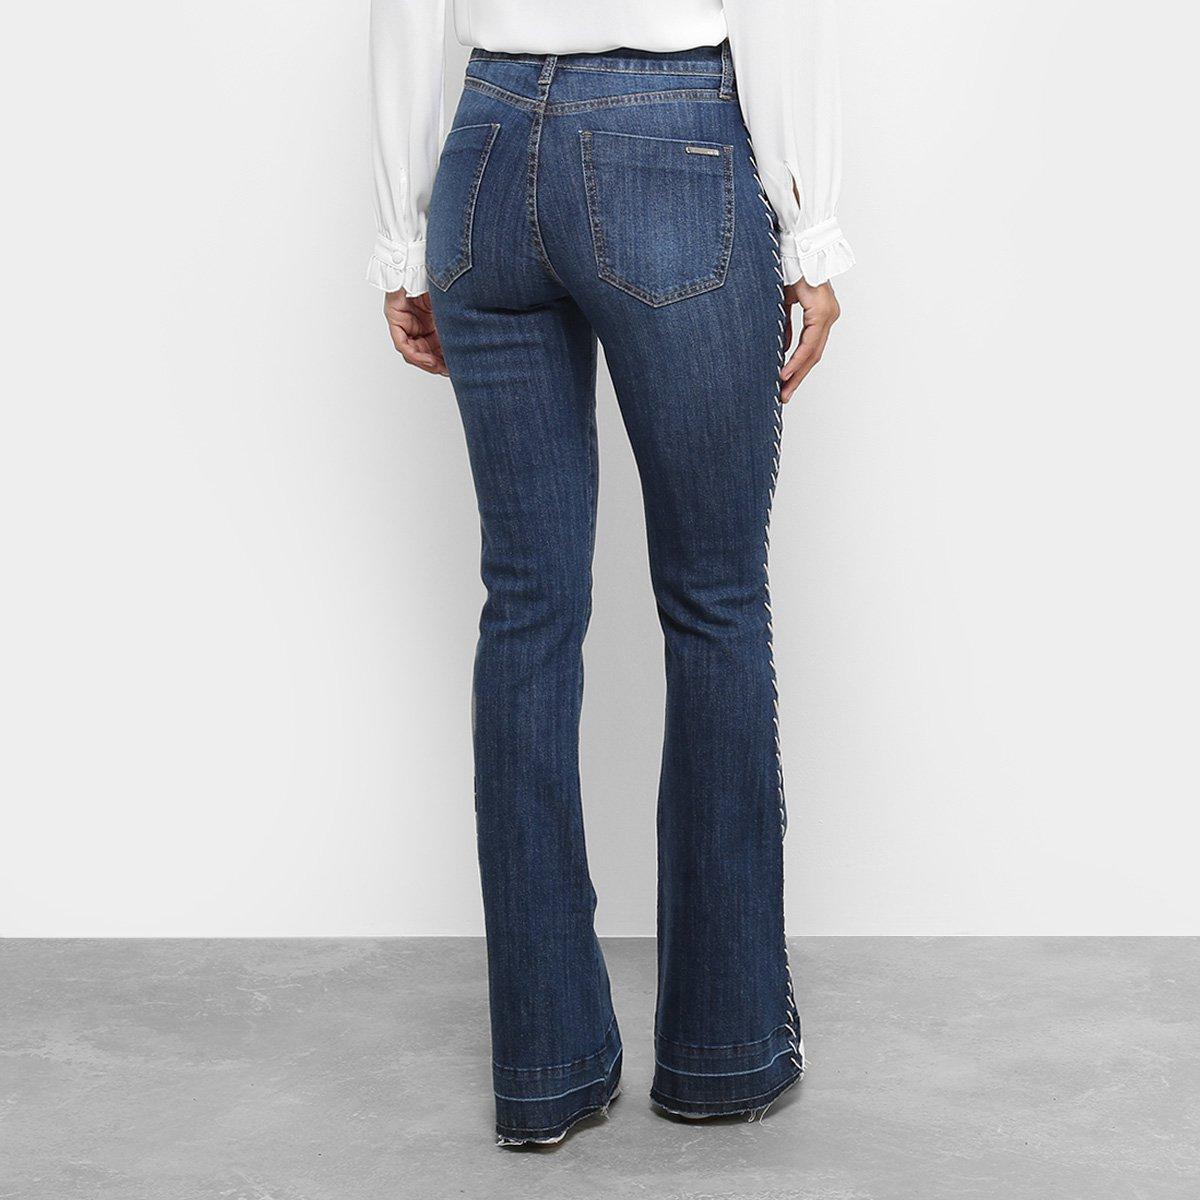 Calça Jeans Flare Mob Bordado Cintura Alta Feminina - Jeans - Compre ... b6f62aeec2